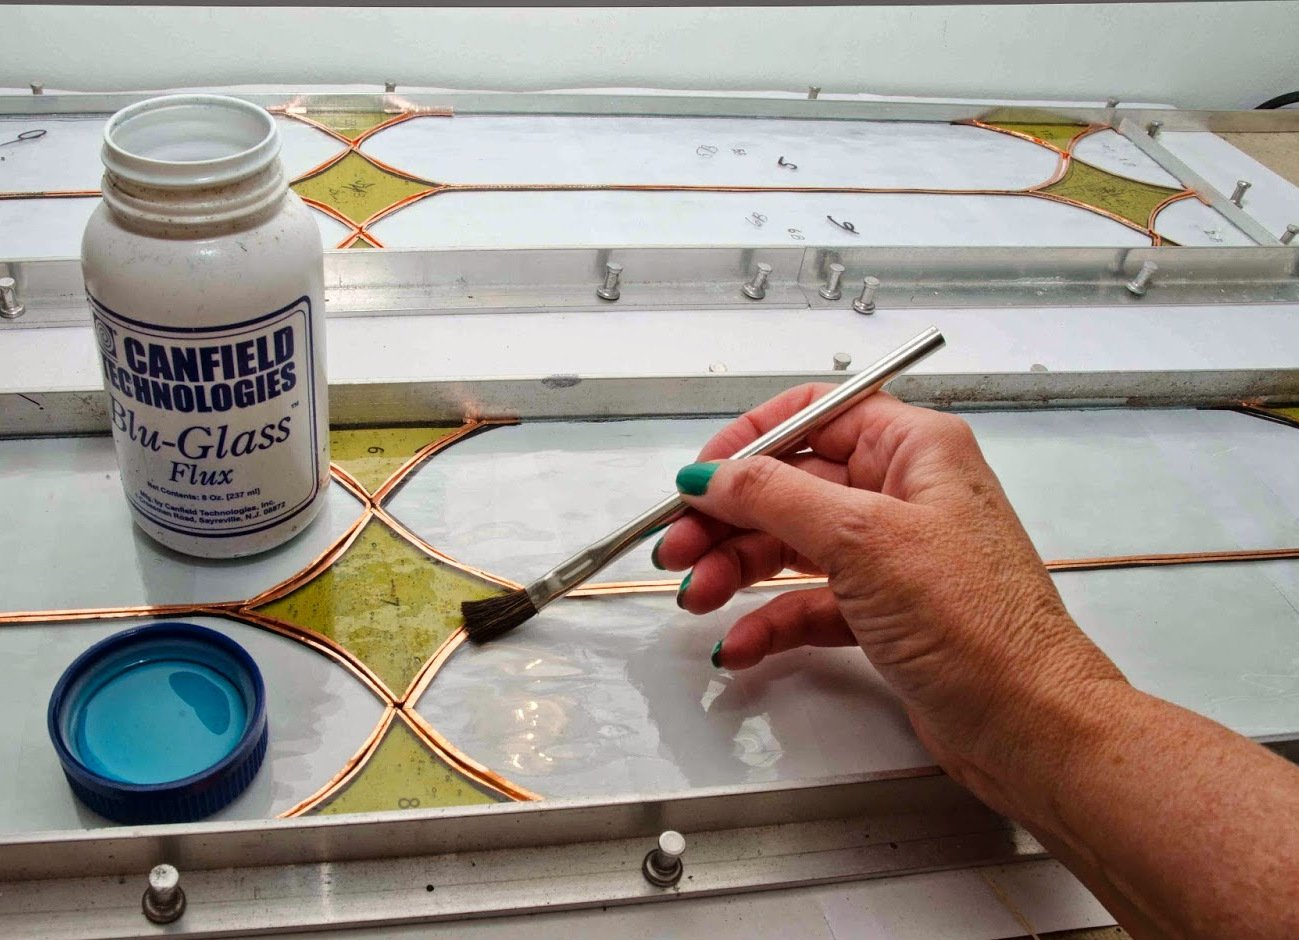 150pc ALAZCO 6'' Long 3/8'' Acid Brushes Natural Flexible Horsehair Bristles - Tin (Metal) Tubular Handles & Ferrules Home School Work Shop Garage by ALAZCO (Image #6)